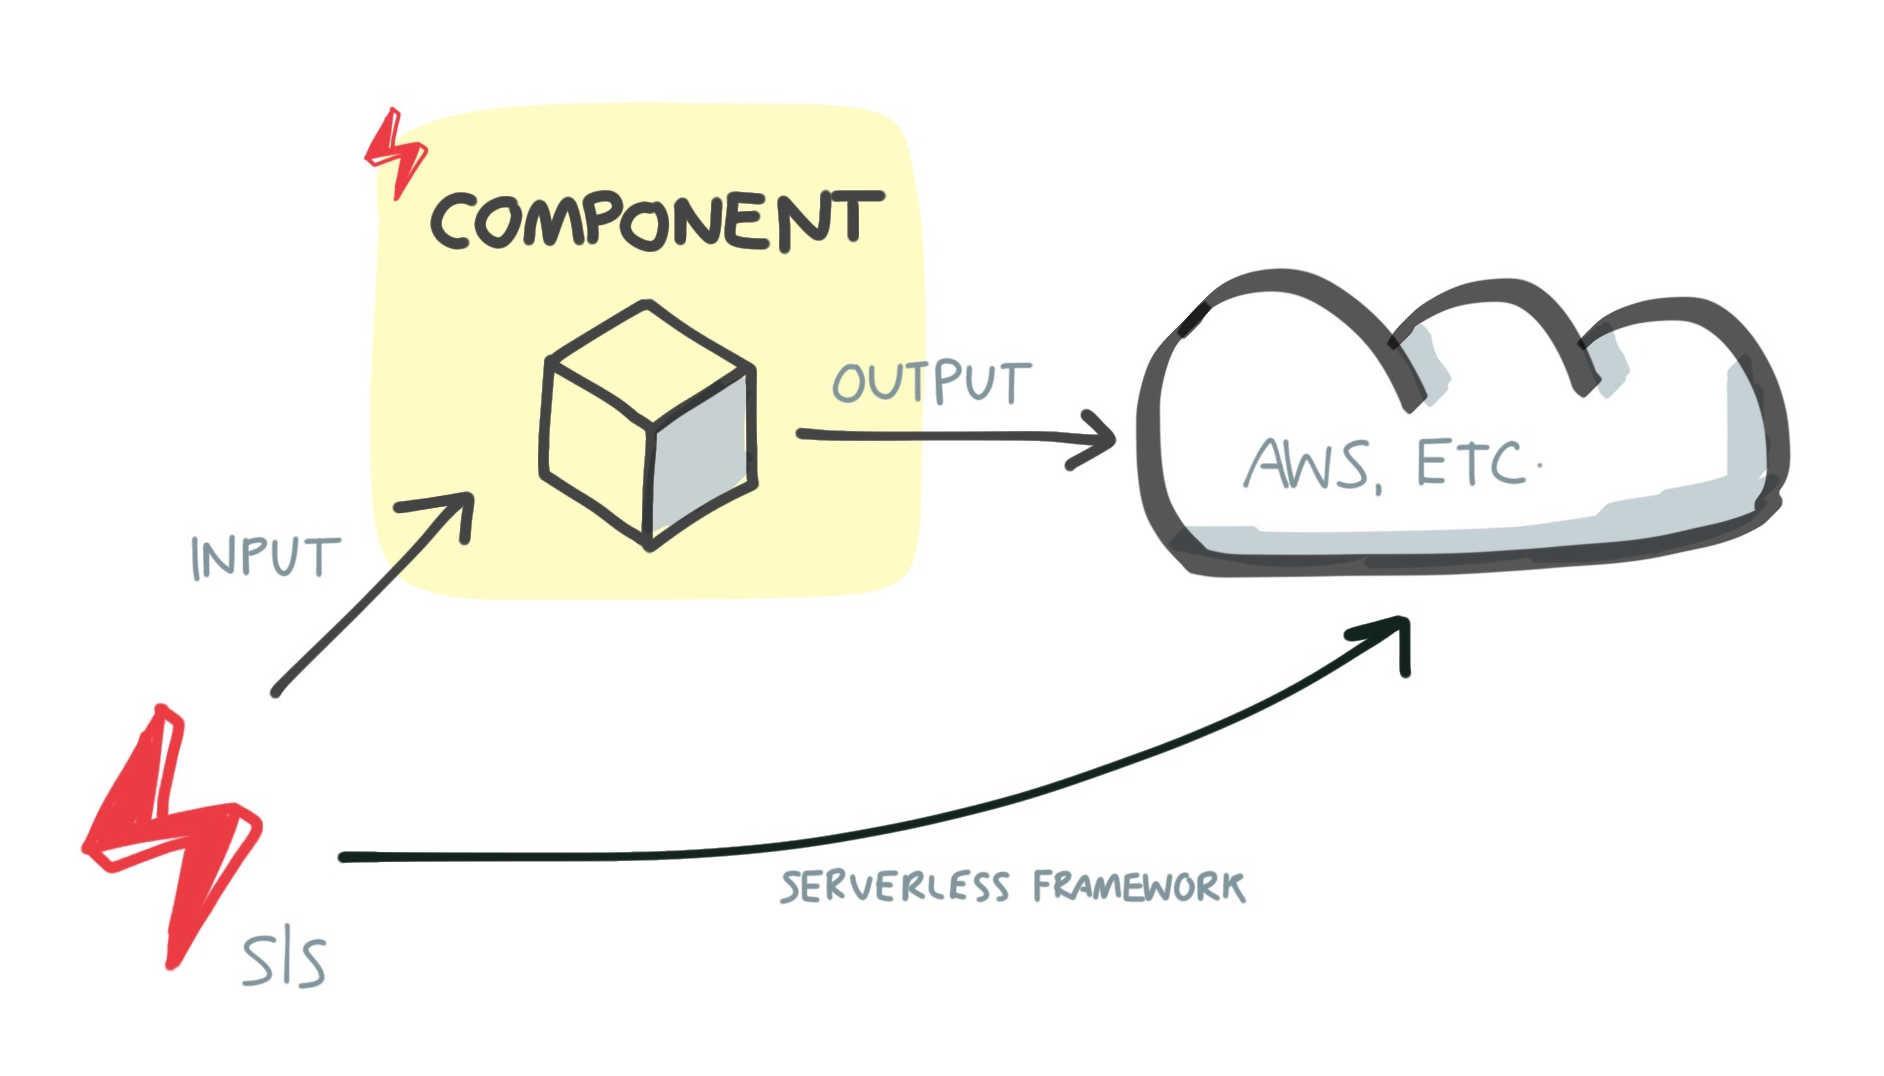 Serverless Framework vs Serverless Components